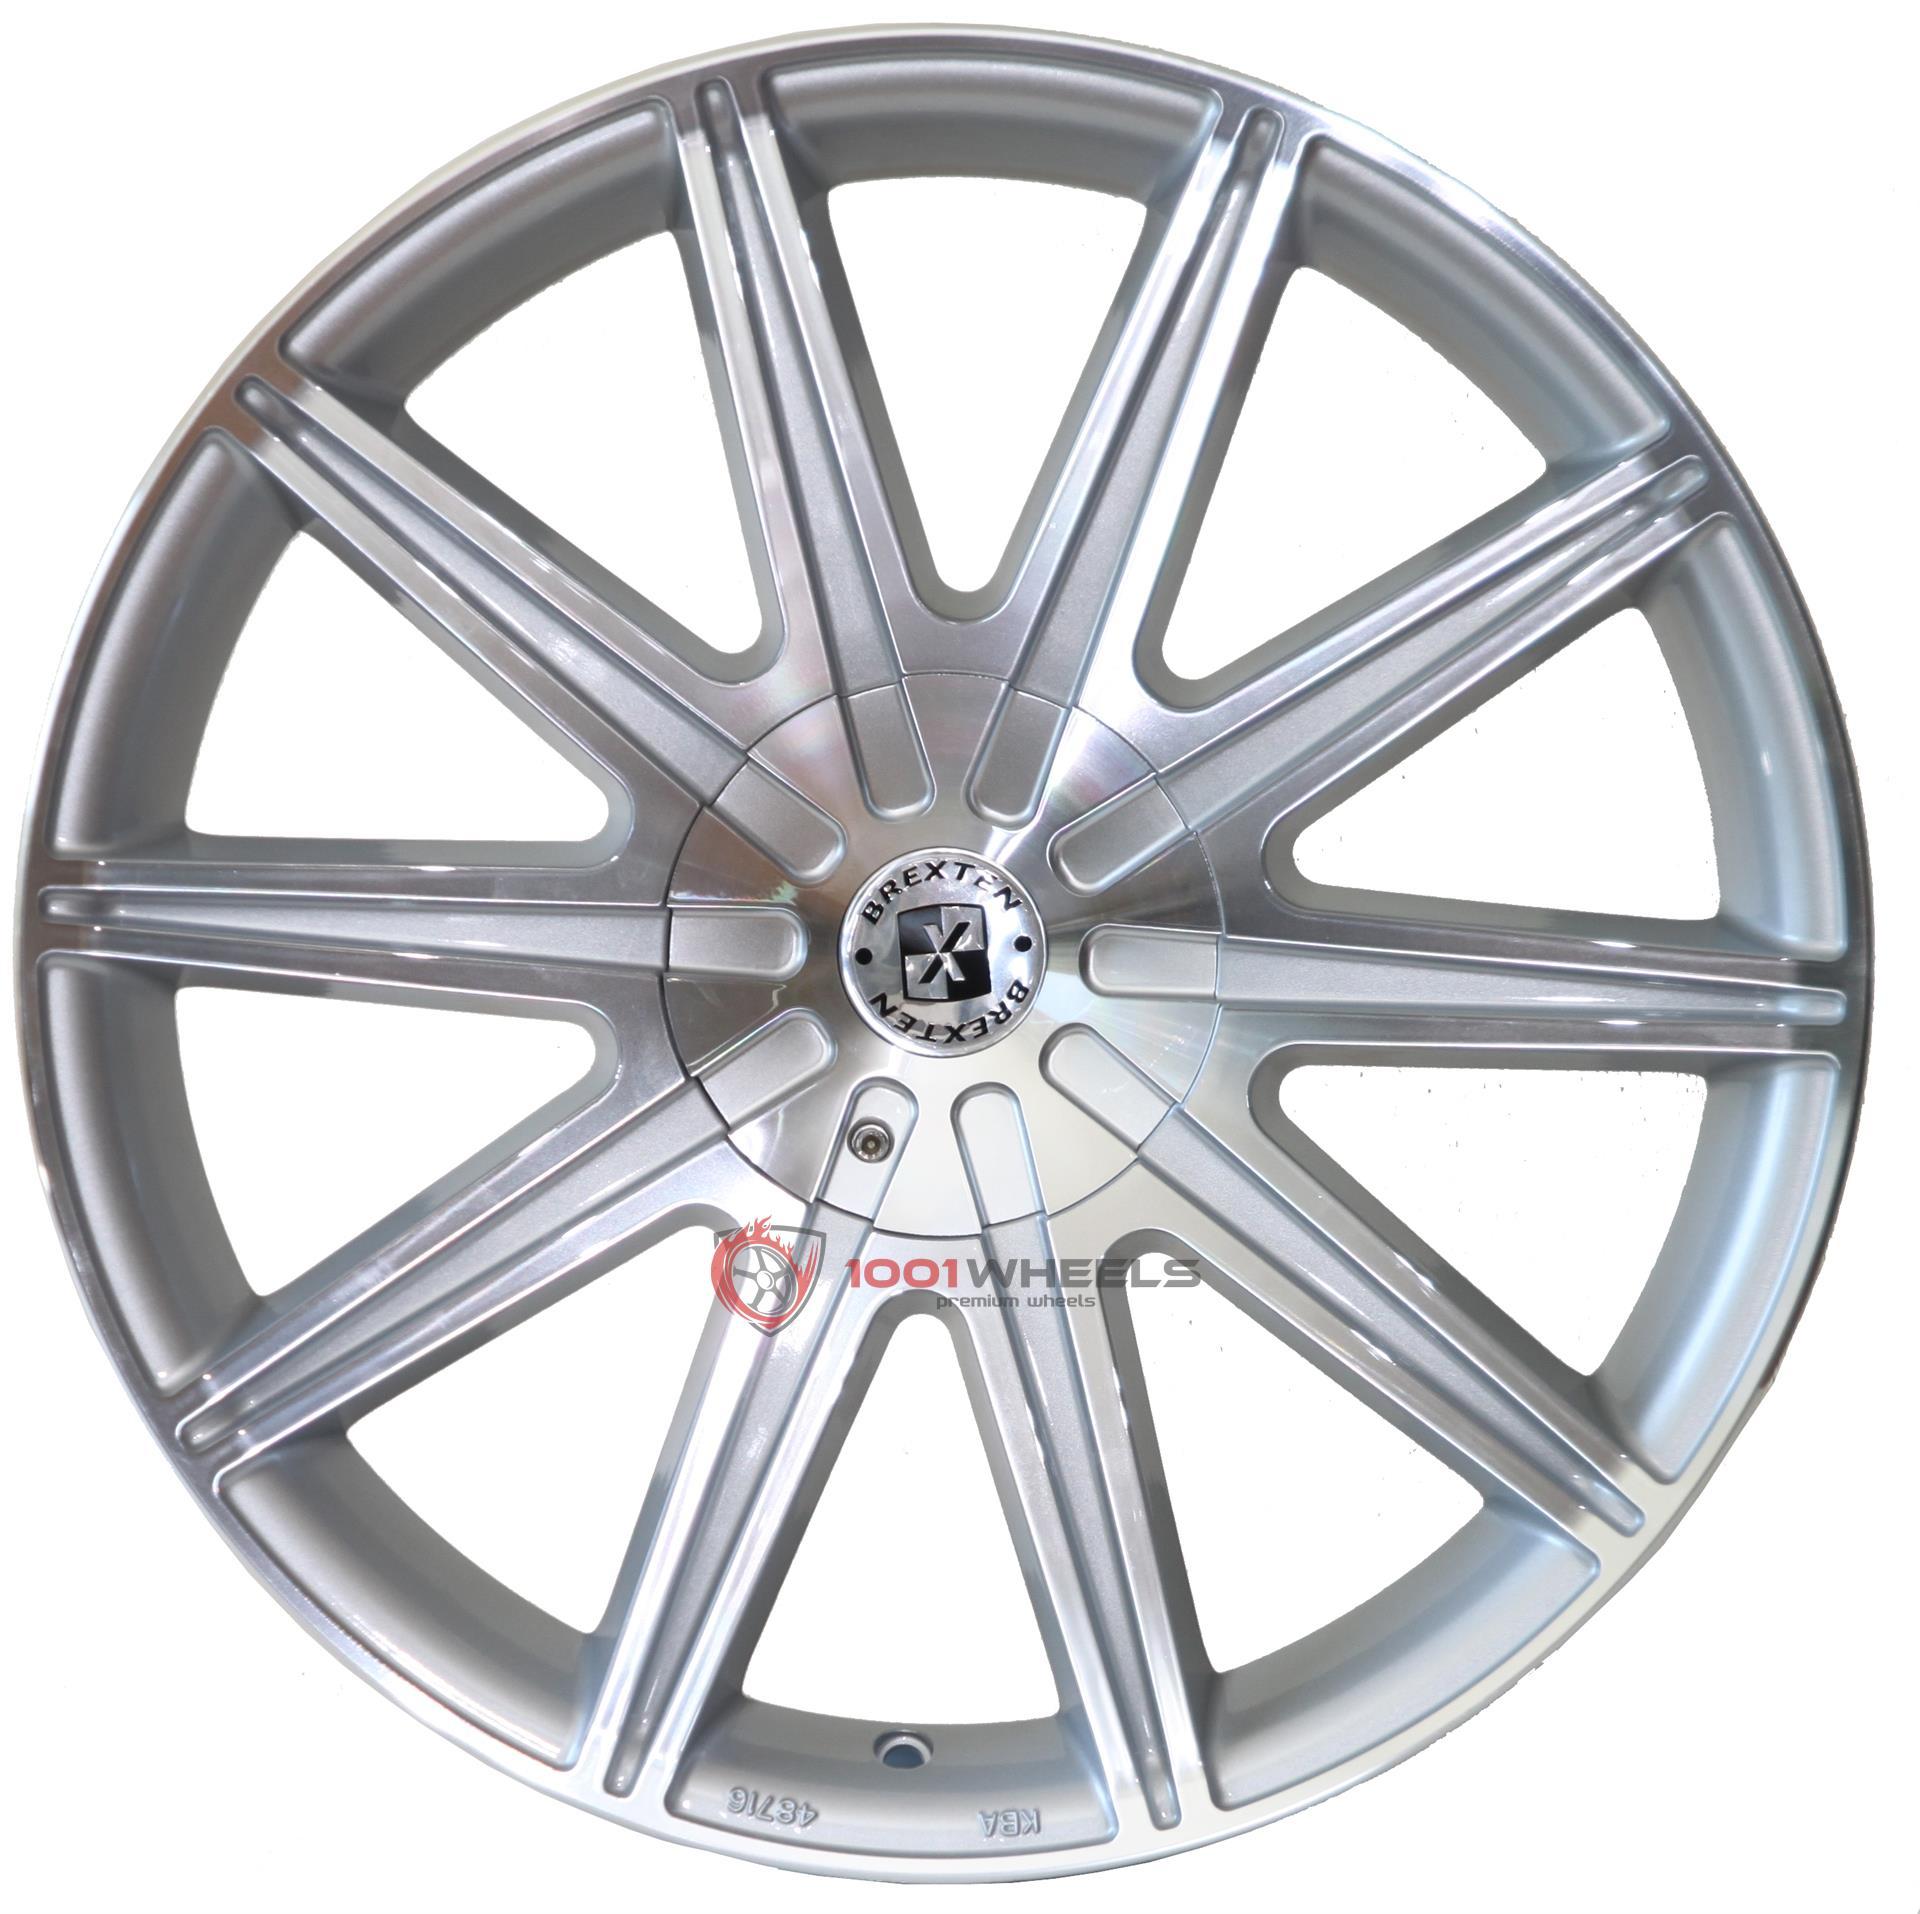 BREXTEN BX-10 silver-polished